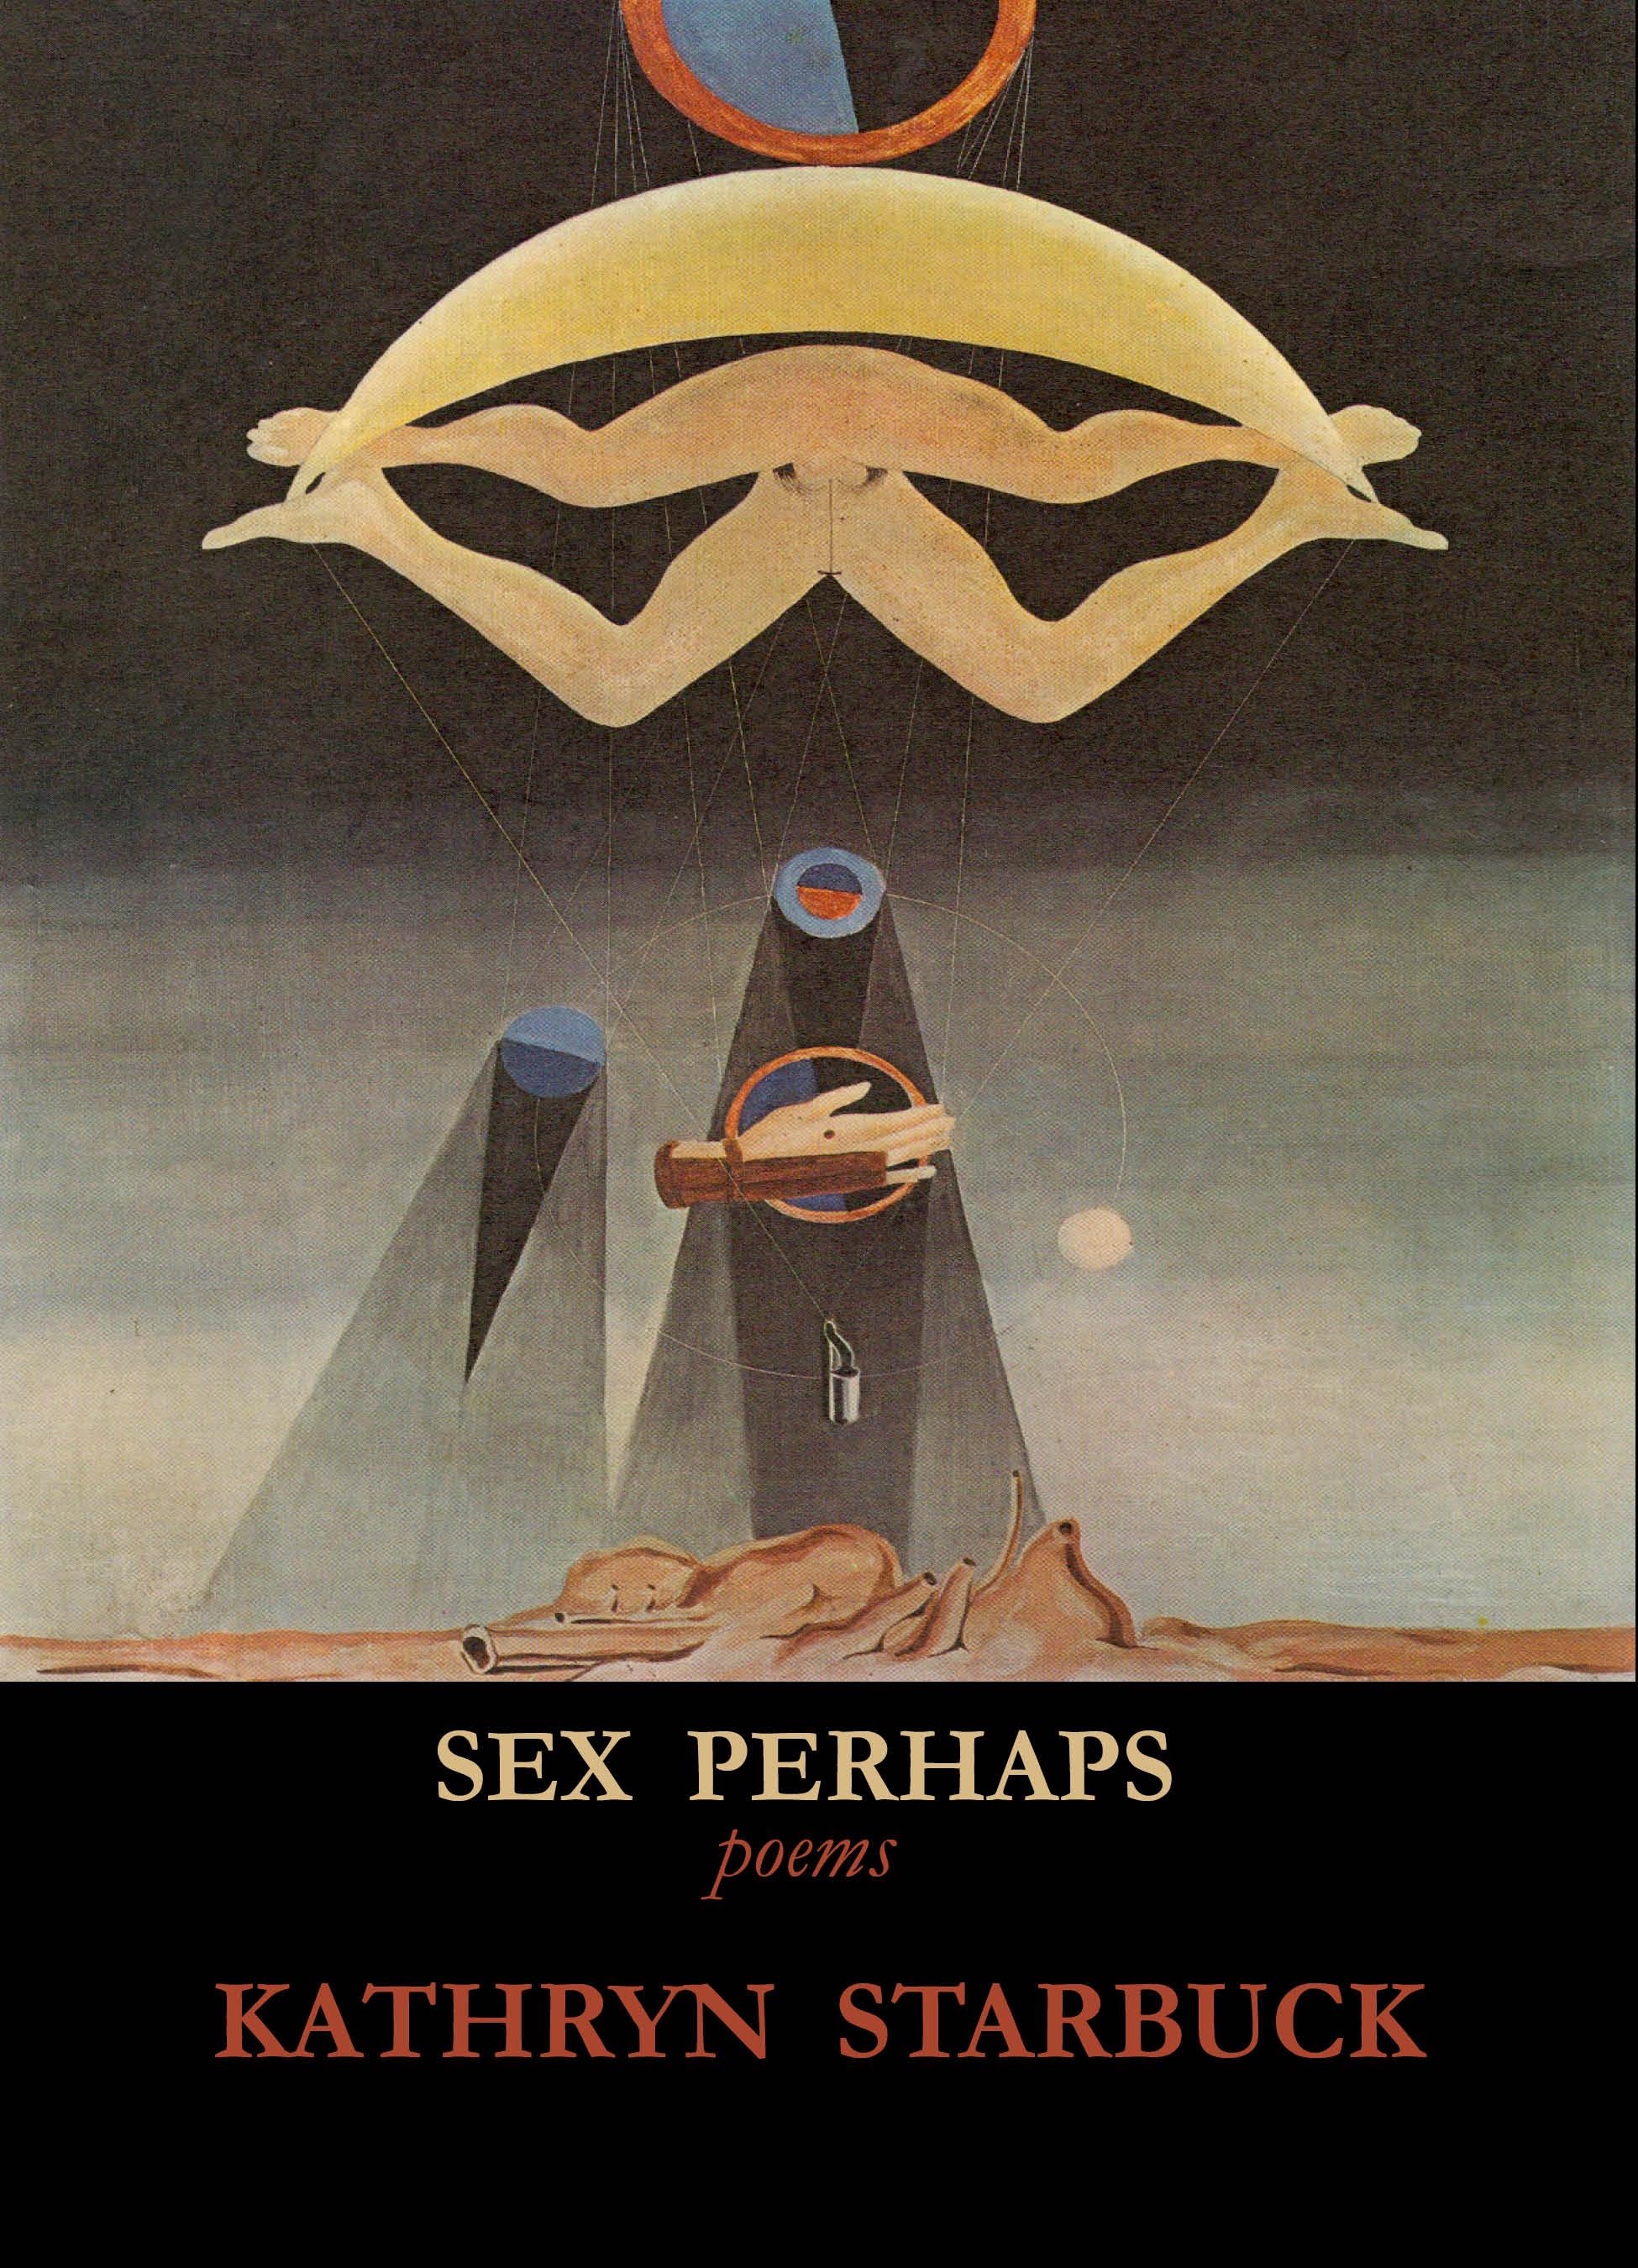 sex perhaps cover.jpg